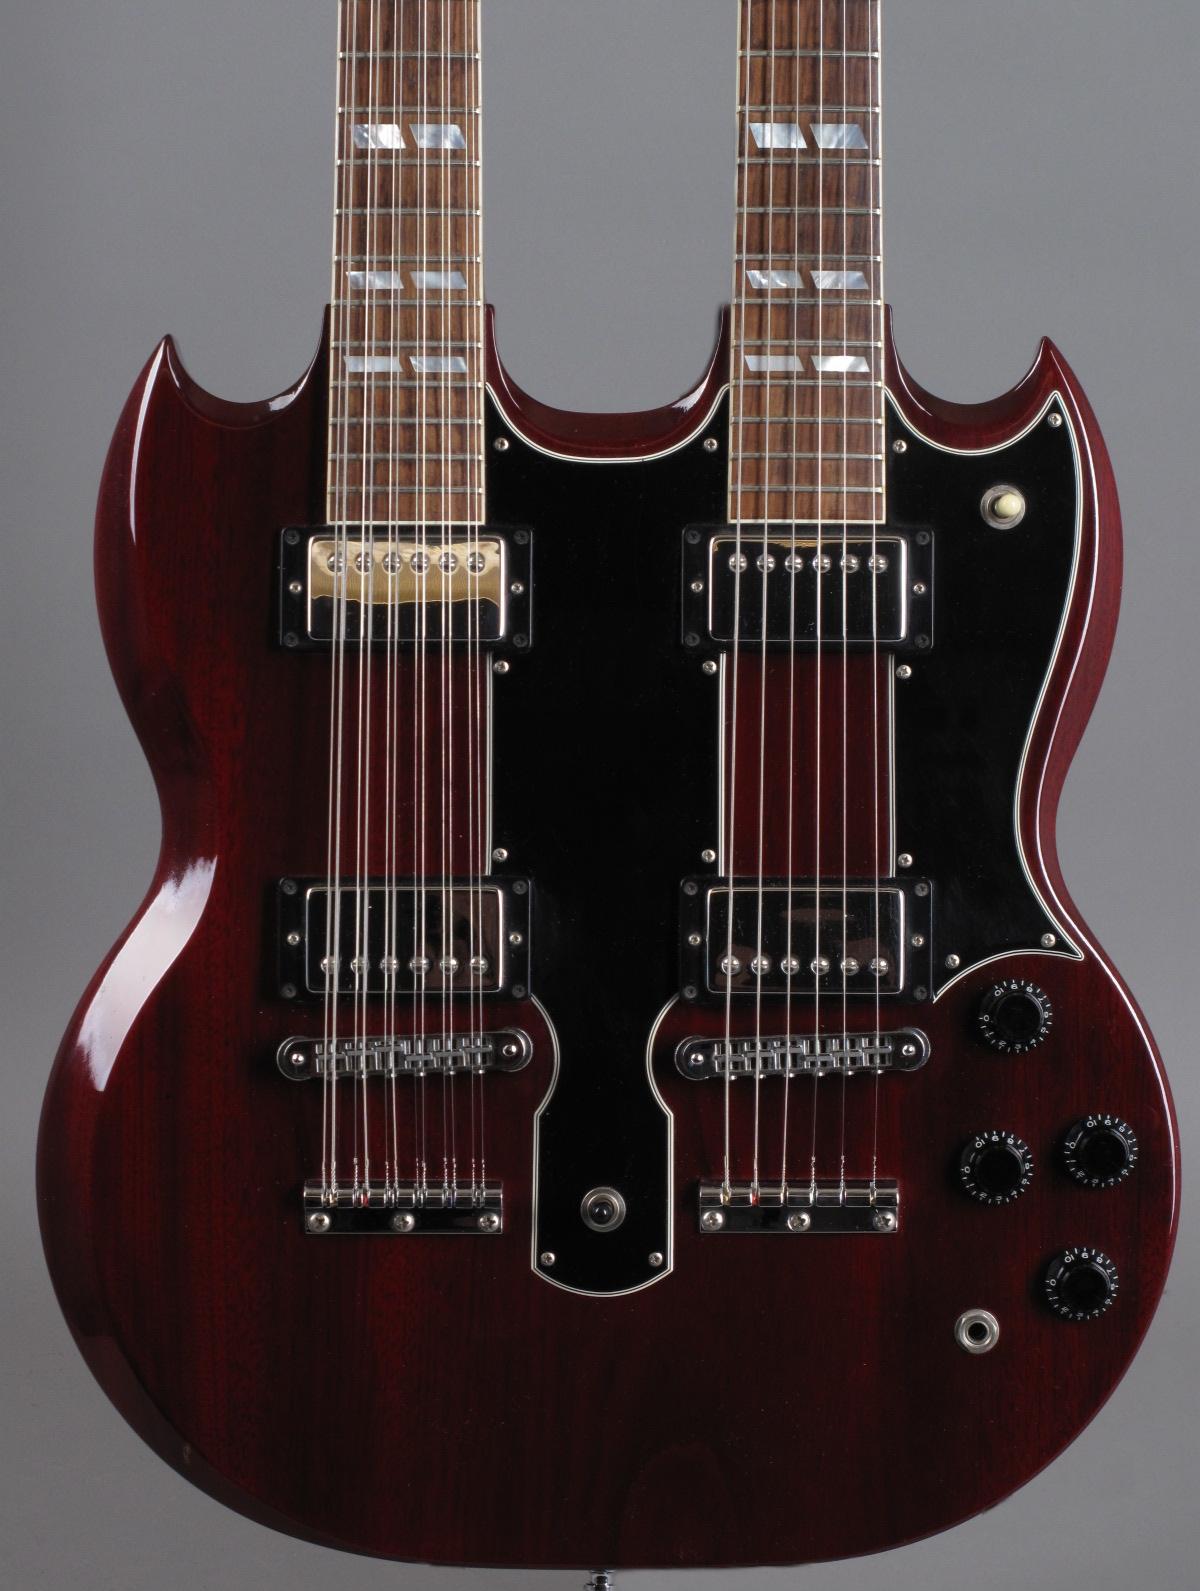 1996 Gibson EDS-1275 Doubleneck - Cherry